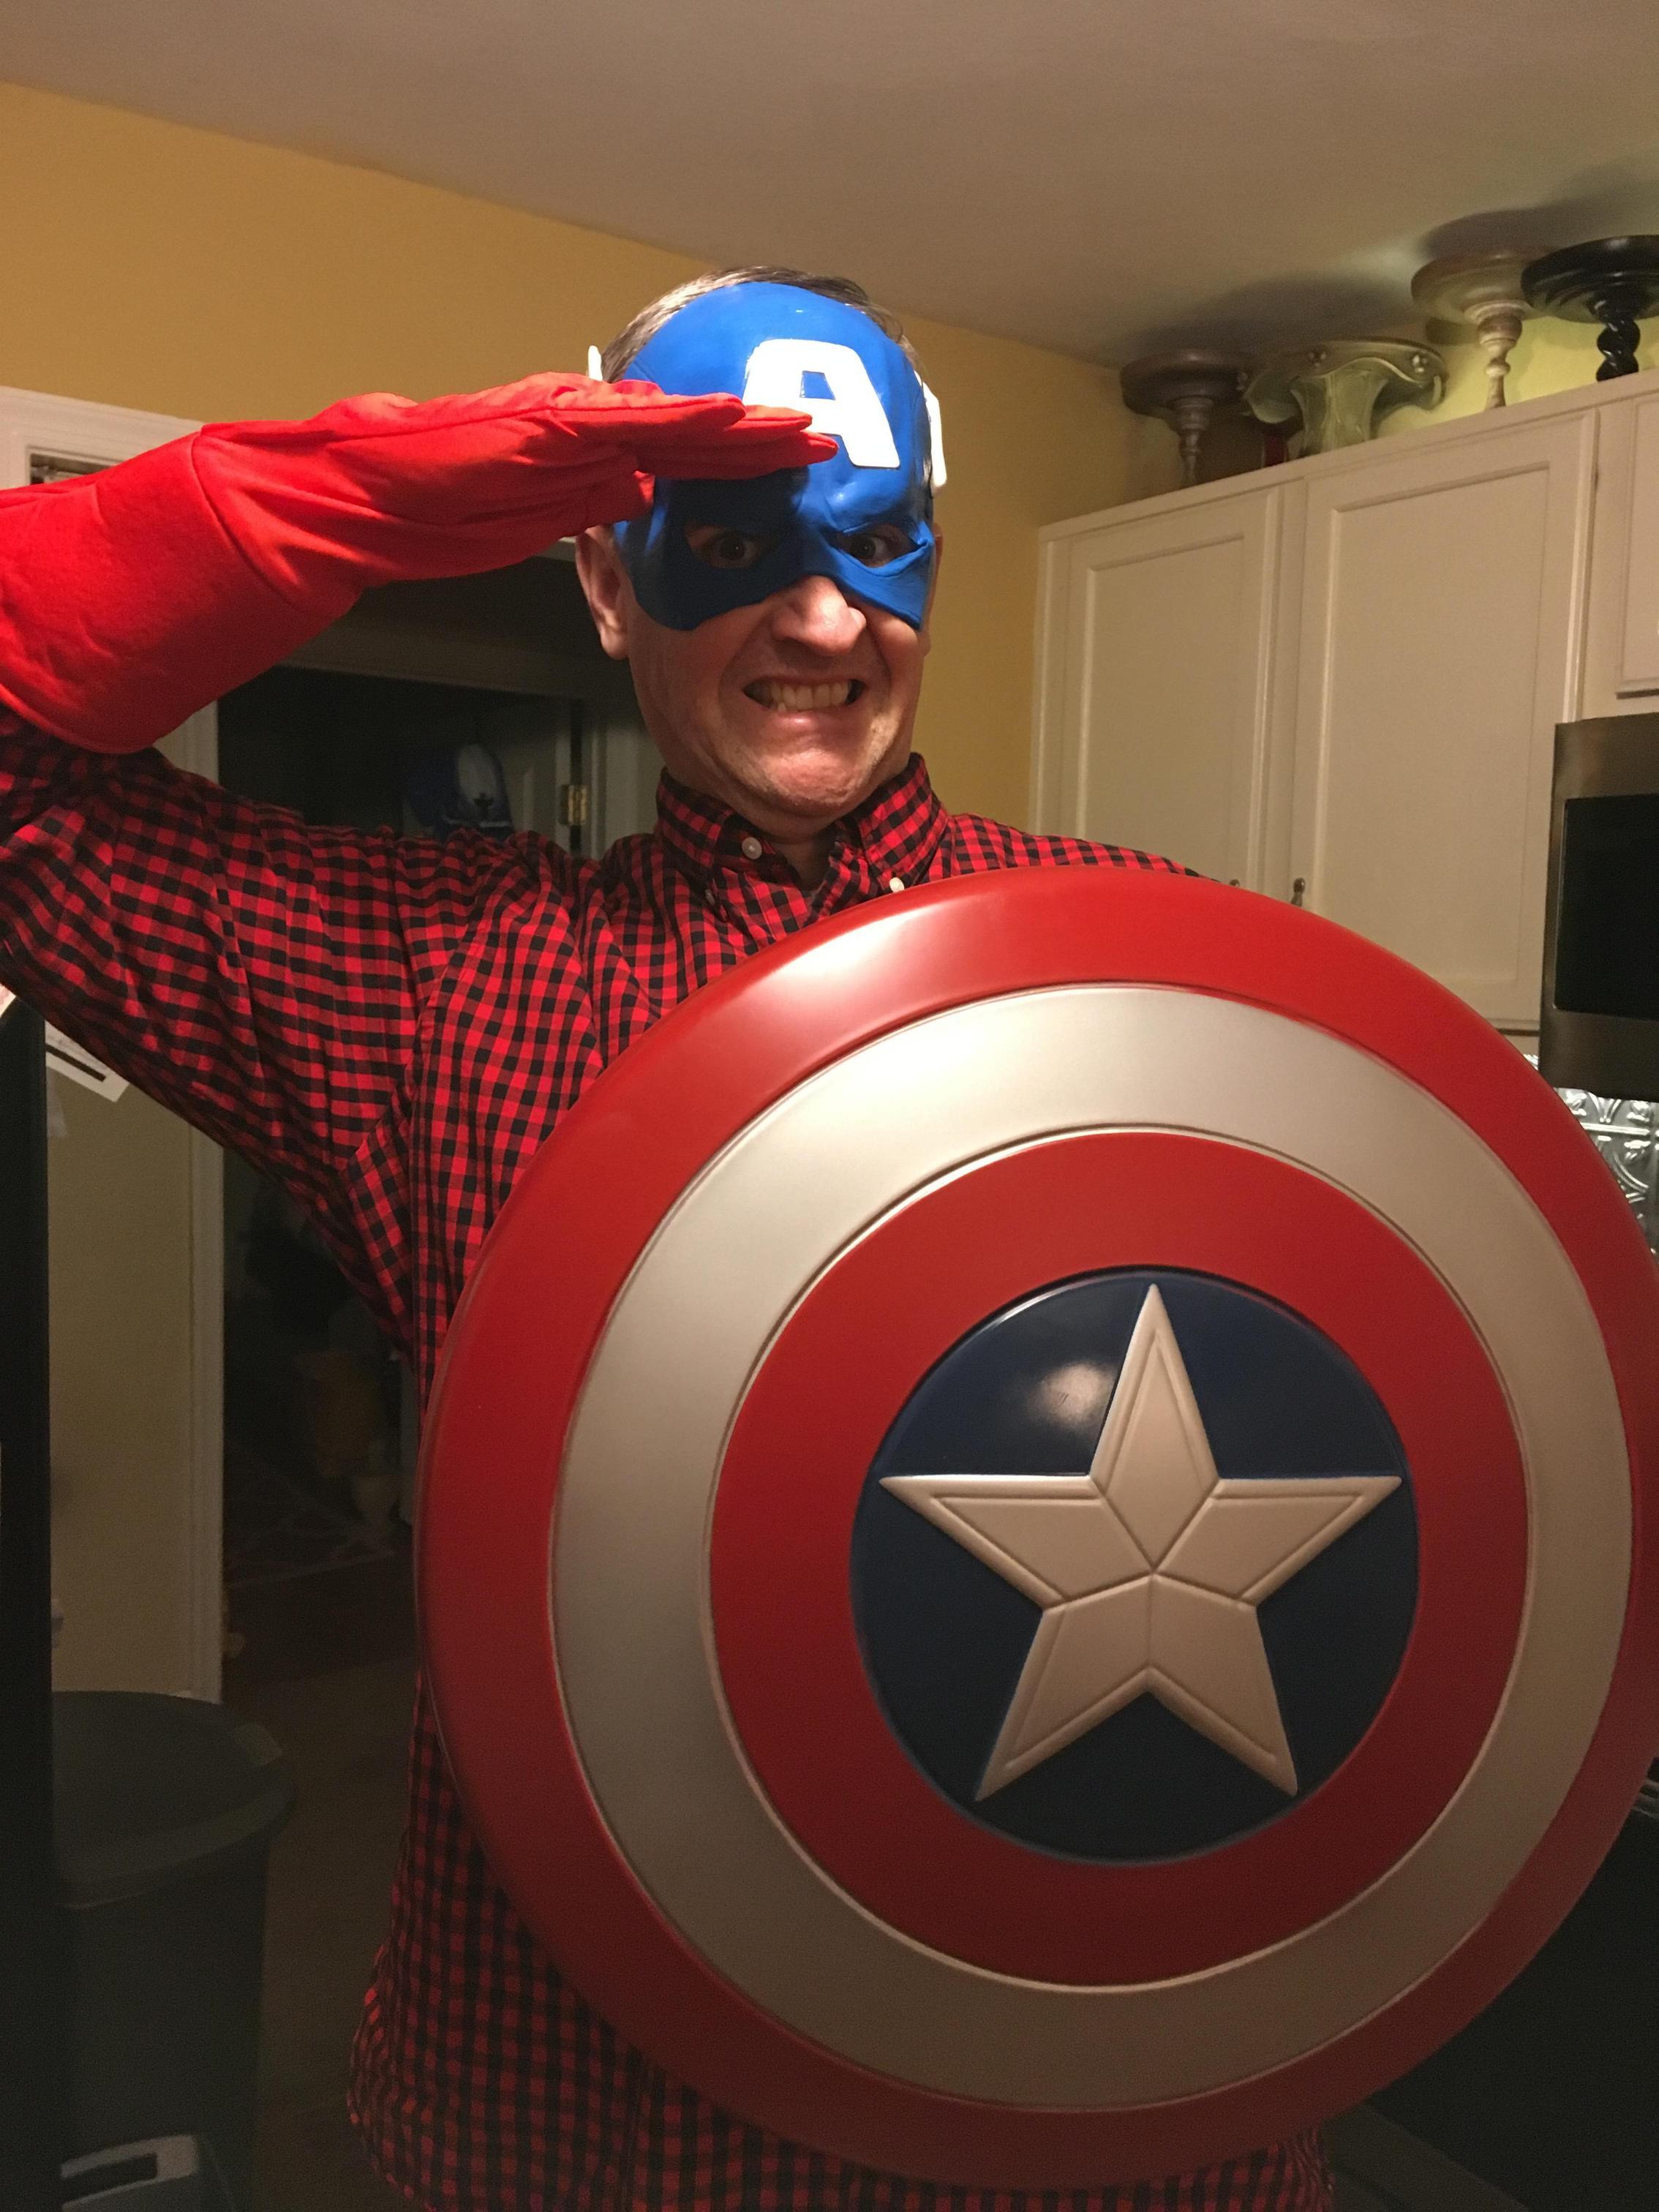 mr. brennan dressed as captain america